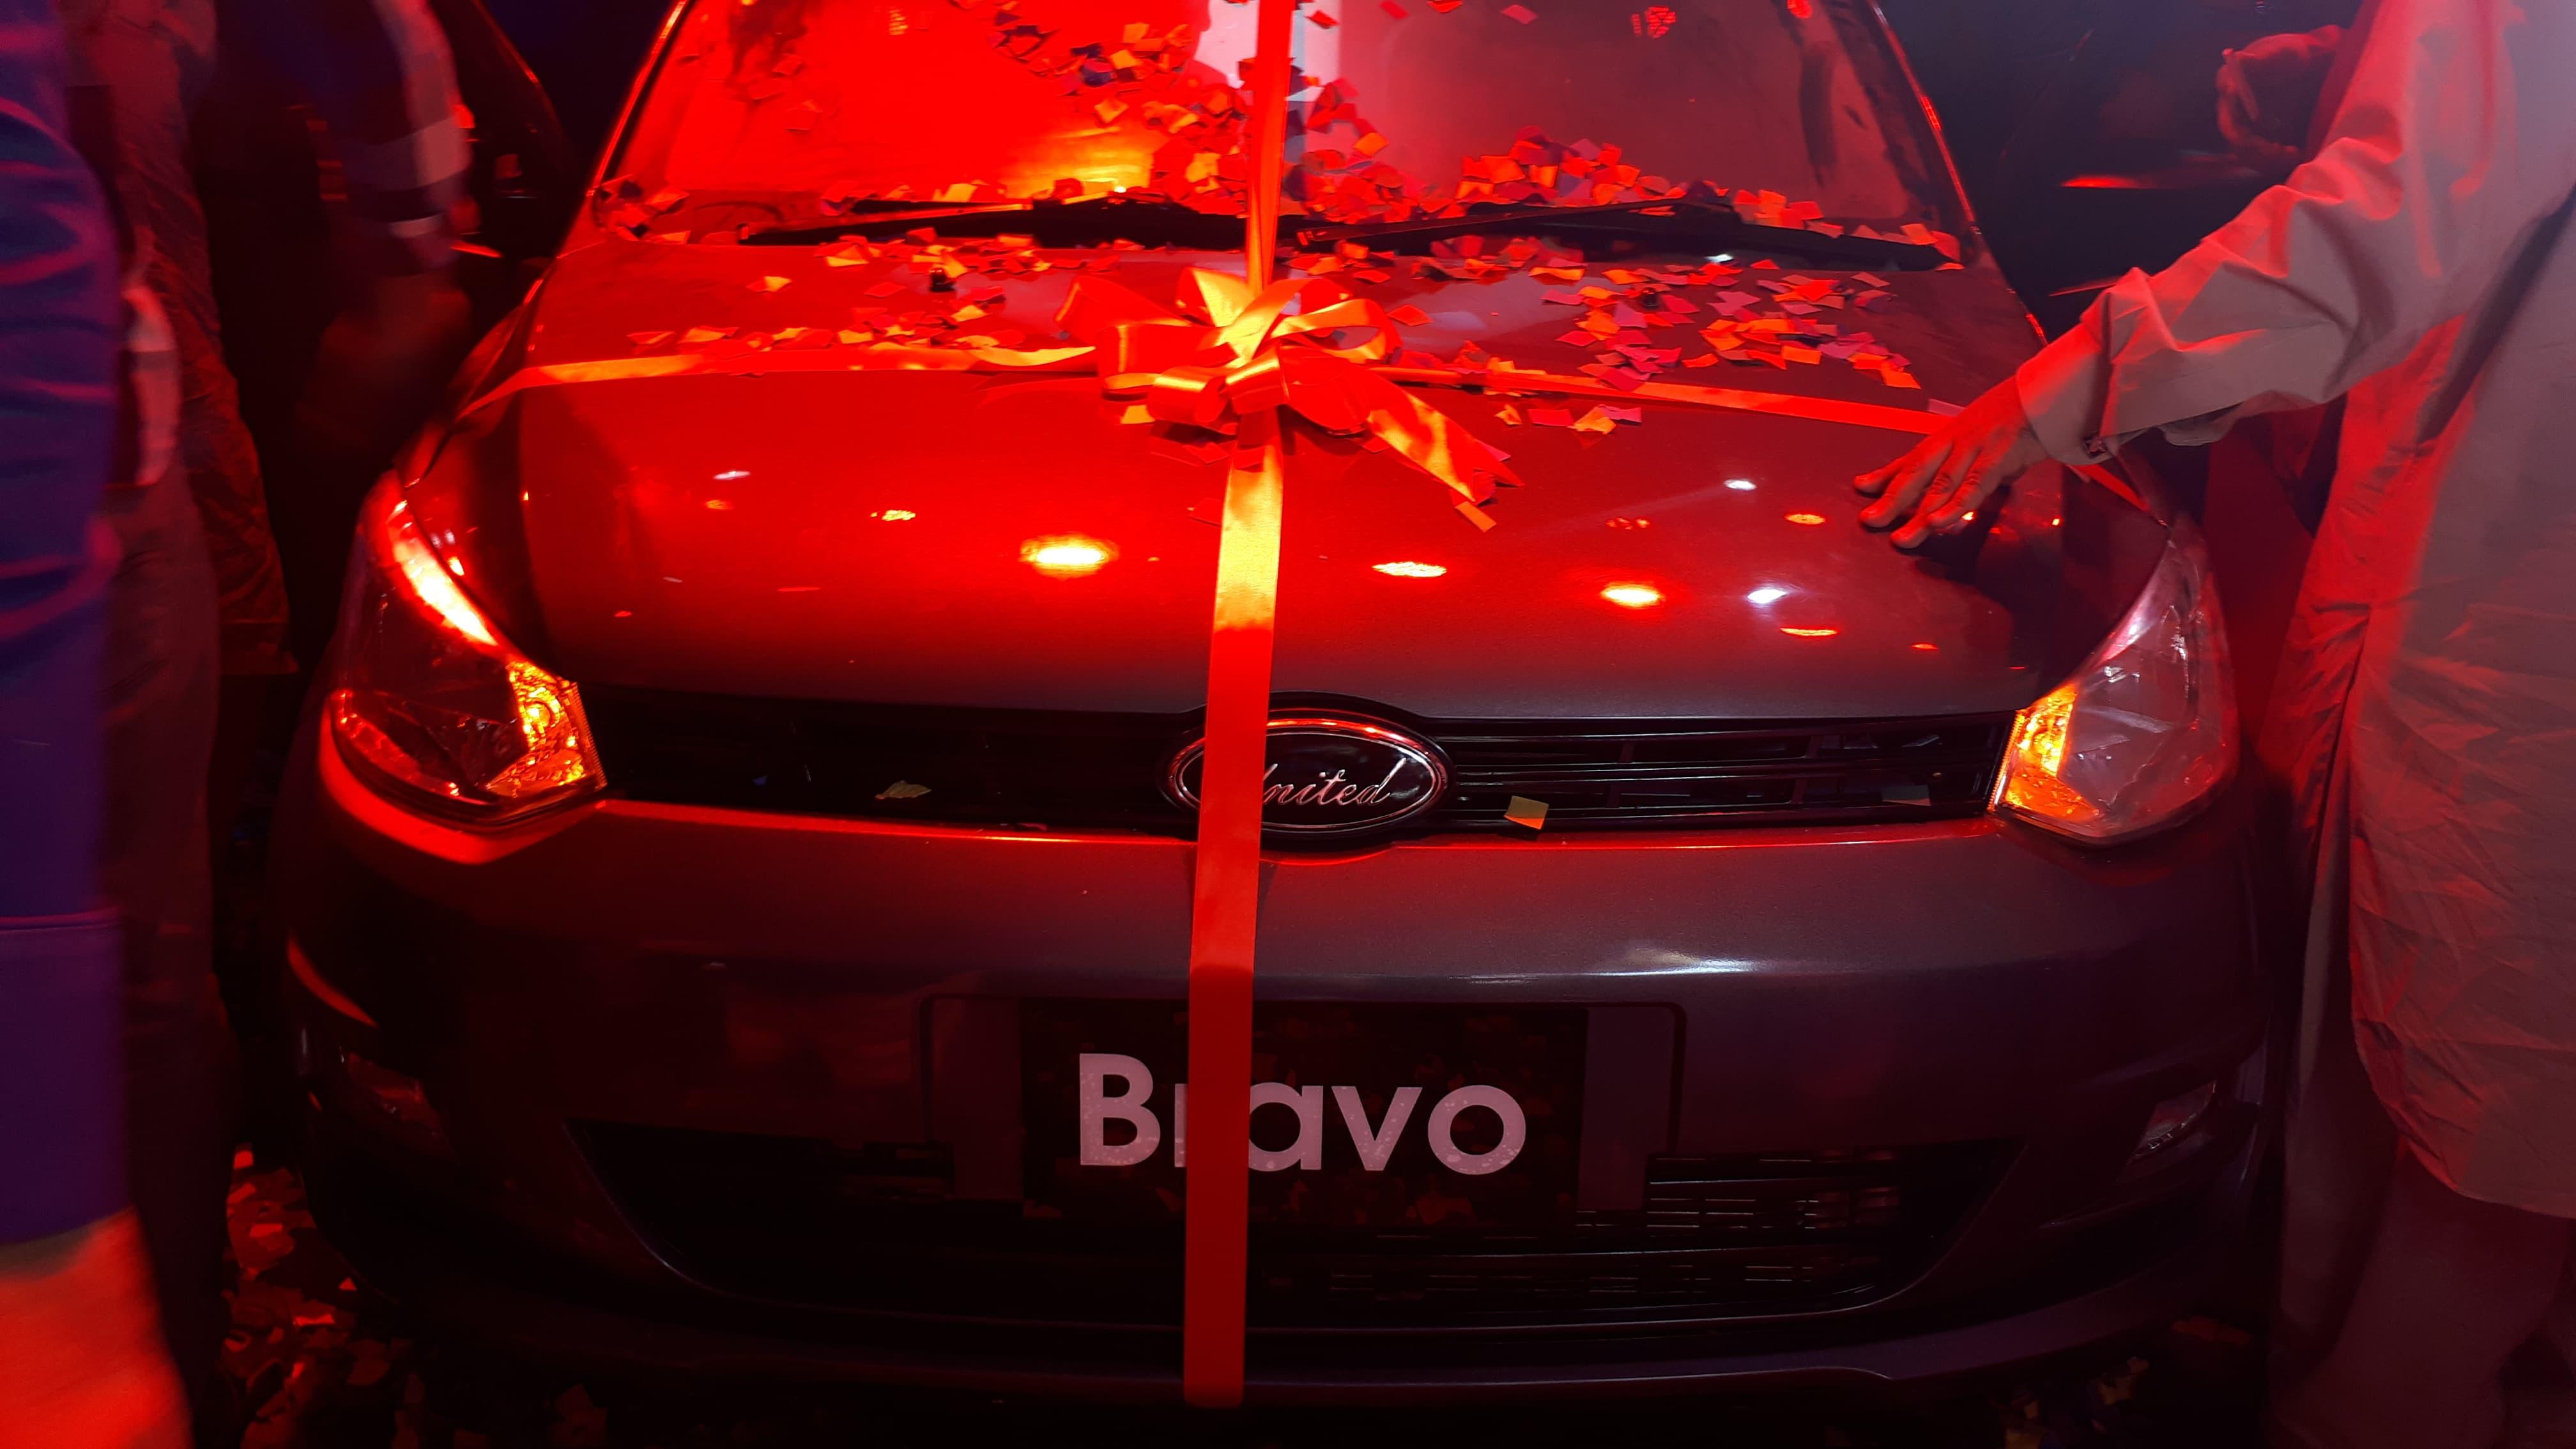 United Autos Launched 800cc Bravo Car In Pakistan